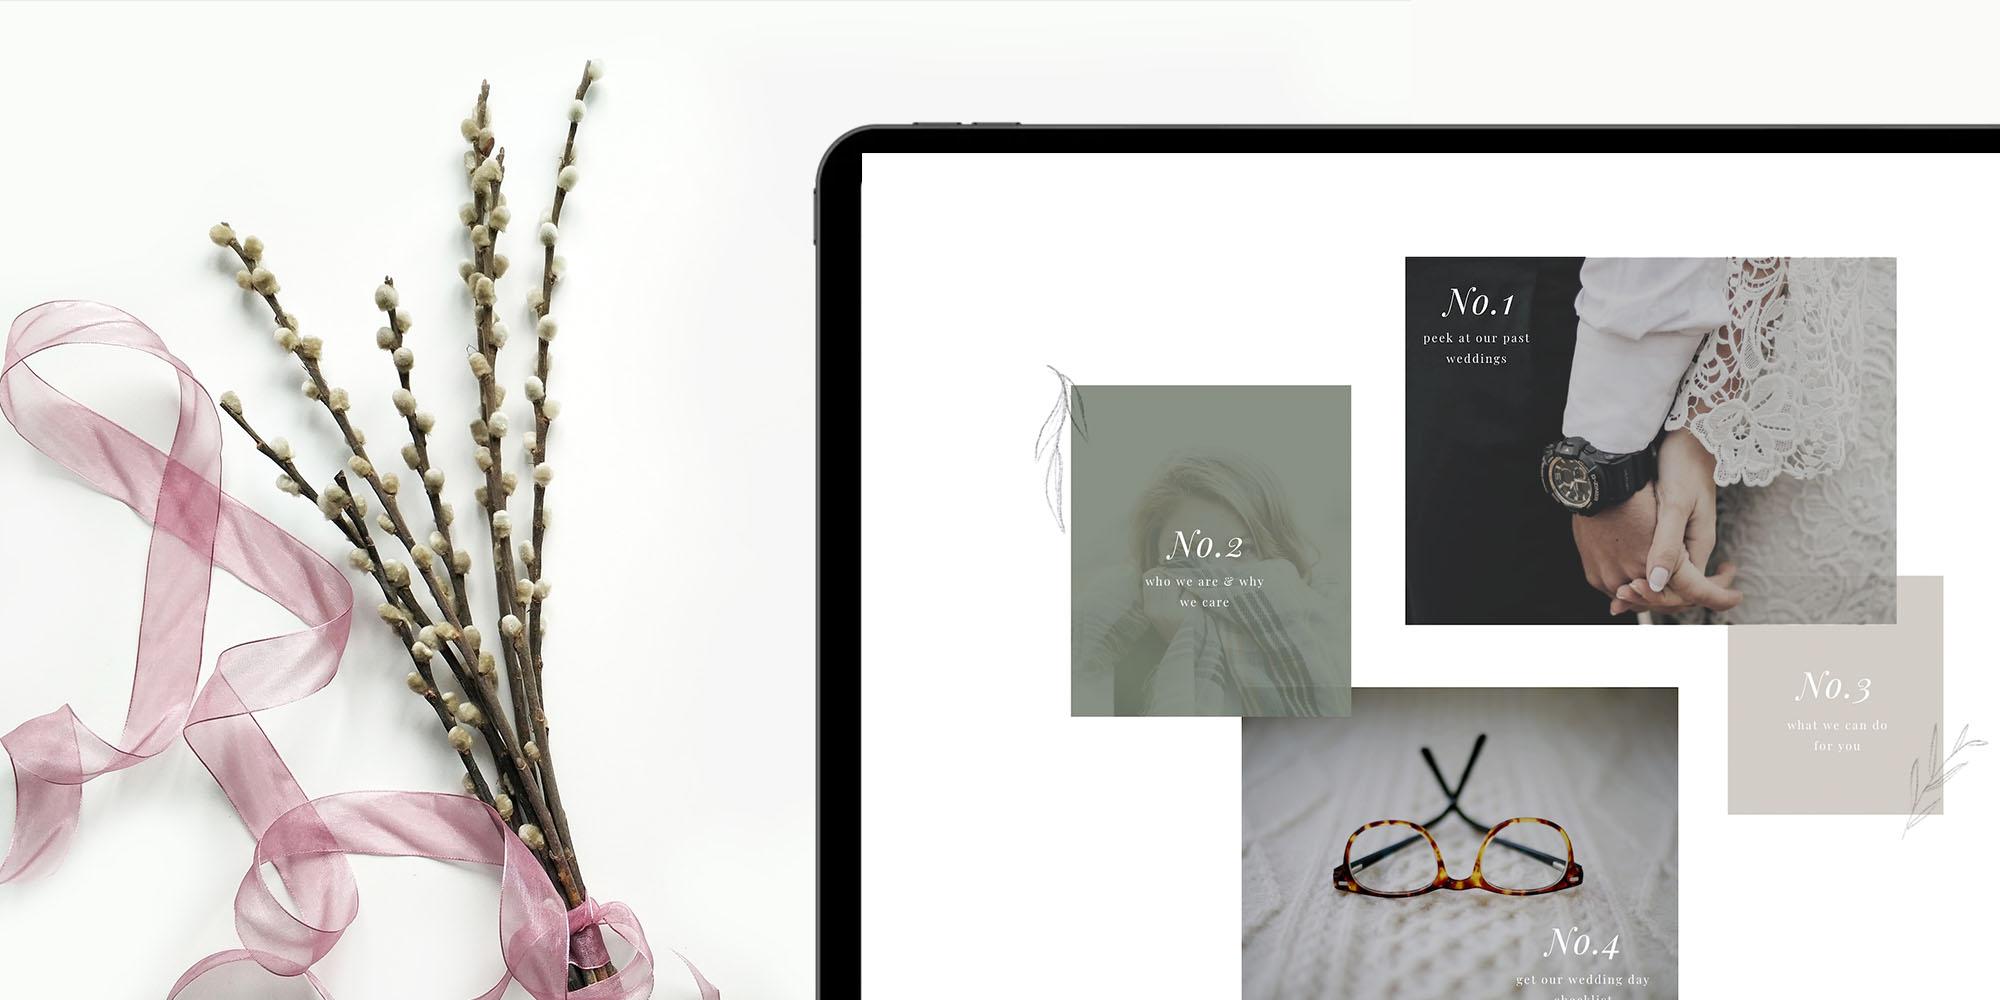 digital marketing and web design company in dubai